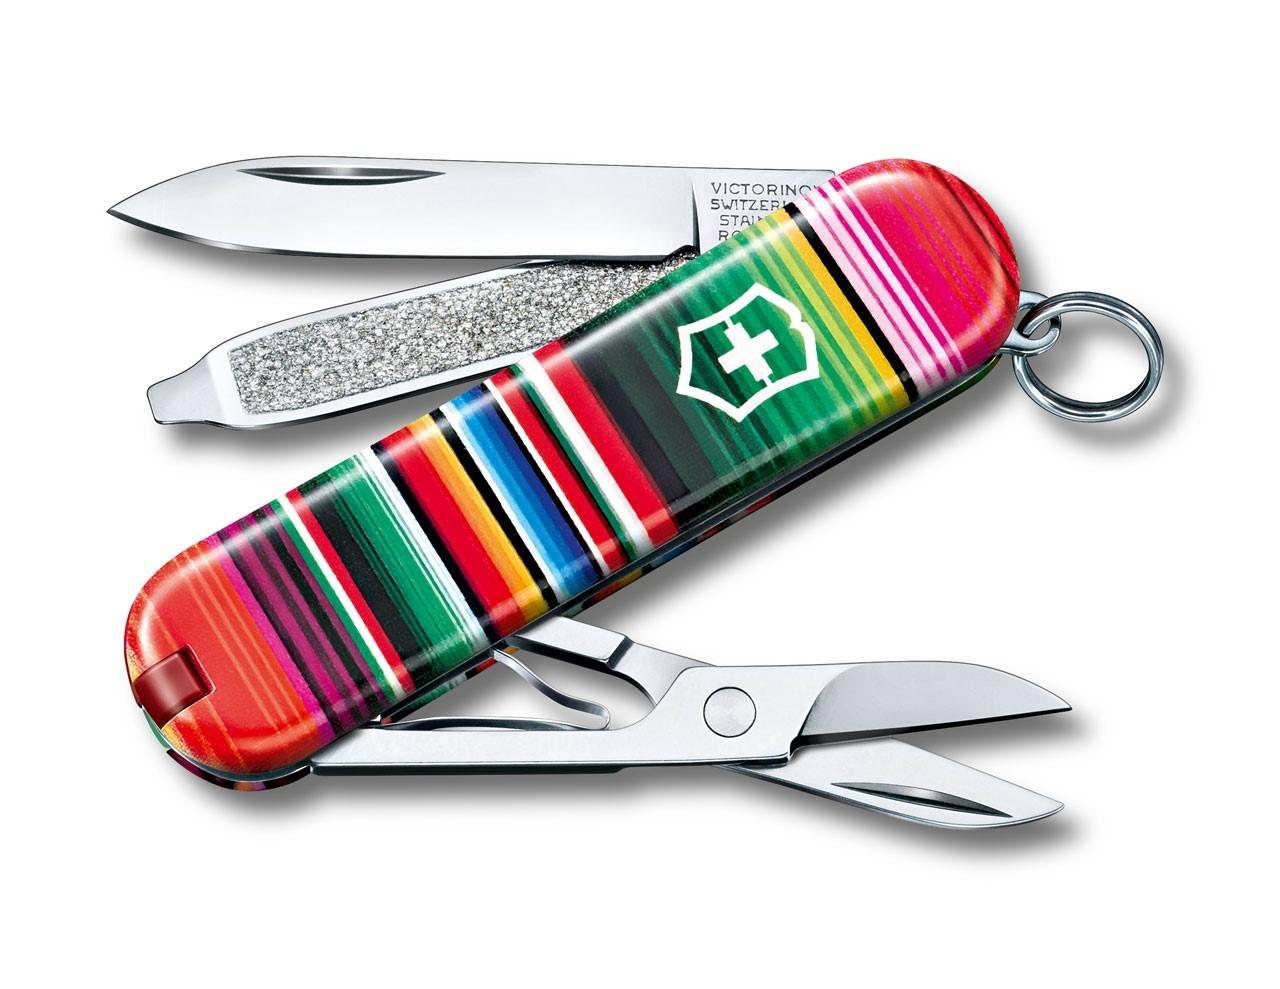 0.6223.L2101 Classic Mexican Zarape   купить в интернет-магазине Wenger-Victorinox.Ru